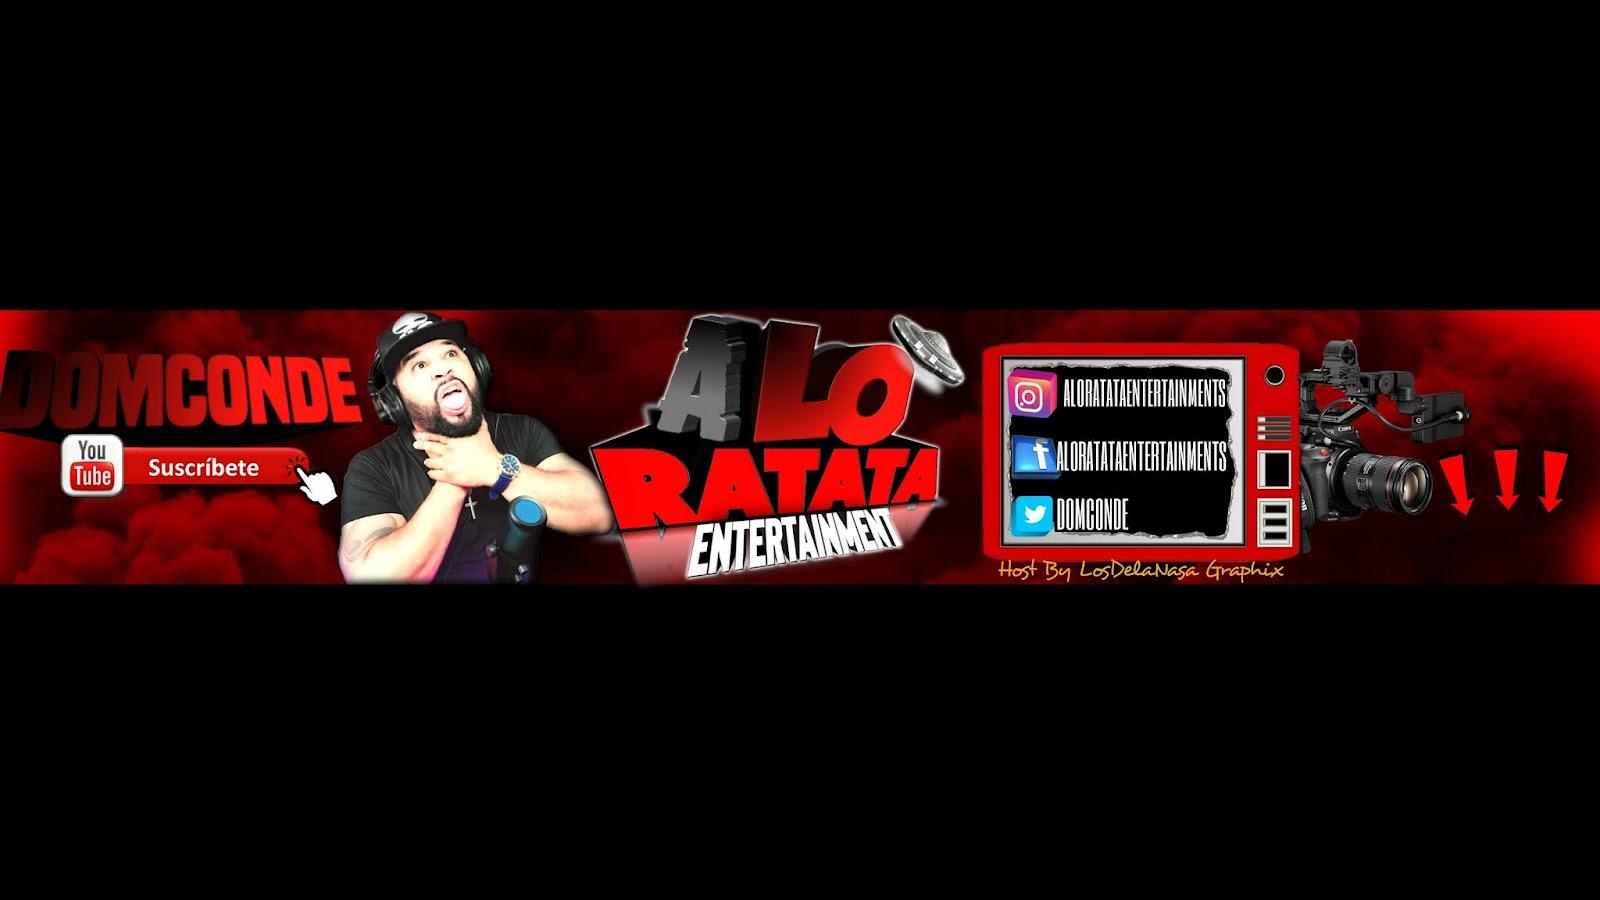 A lo Ratata Entertainments